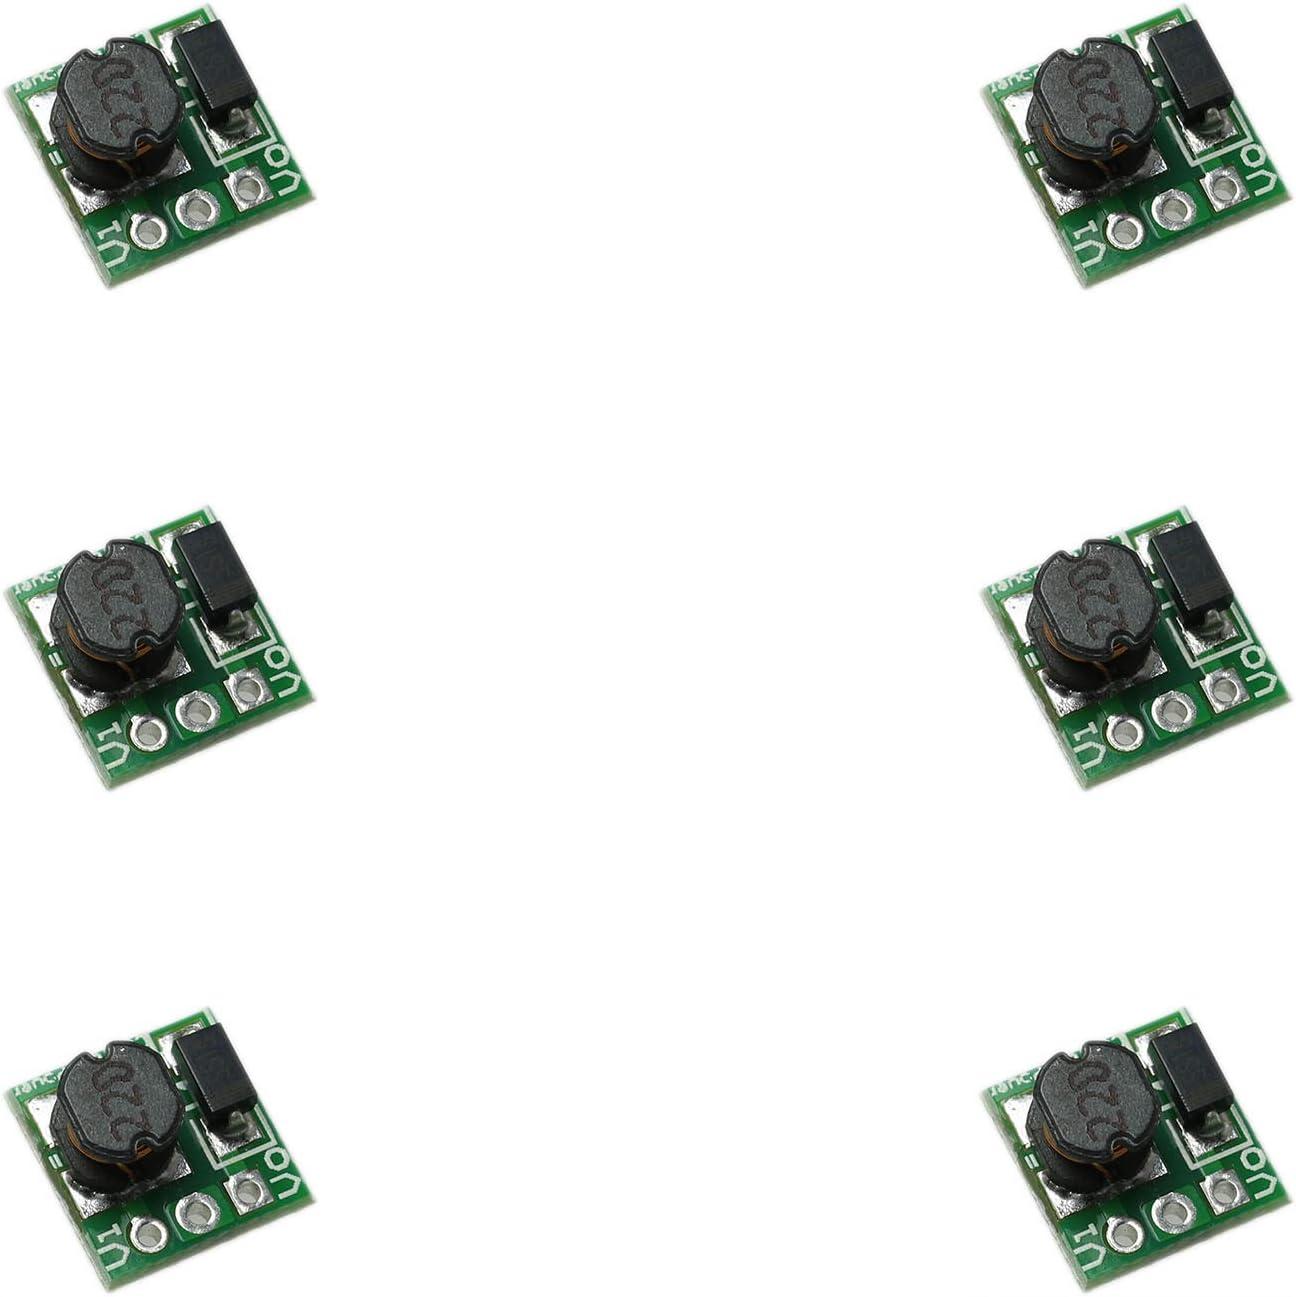 CSNSD 0.9-5V to 3.3V Step Up Power Module 6PCS 1.5V 1.8V 2.5V 3V 3.7V 4.2V 5V to 3.3V DC-DC Voltage Boost Converter Board